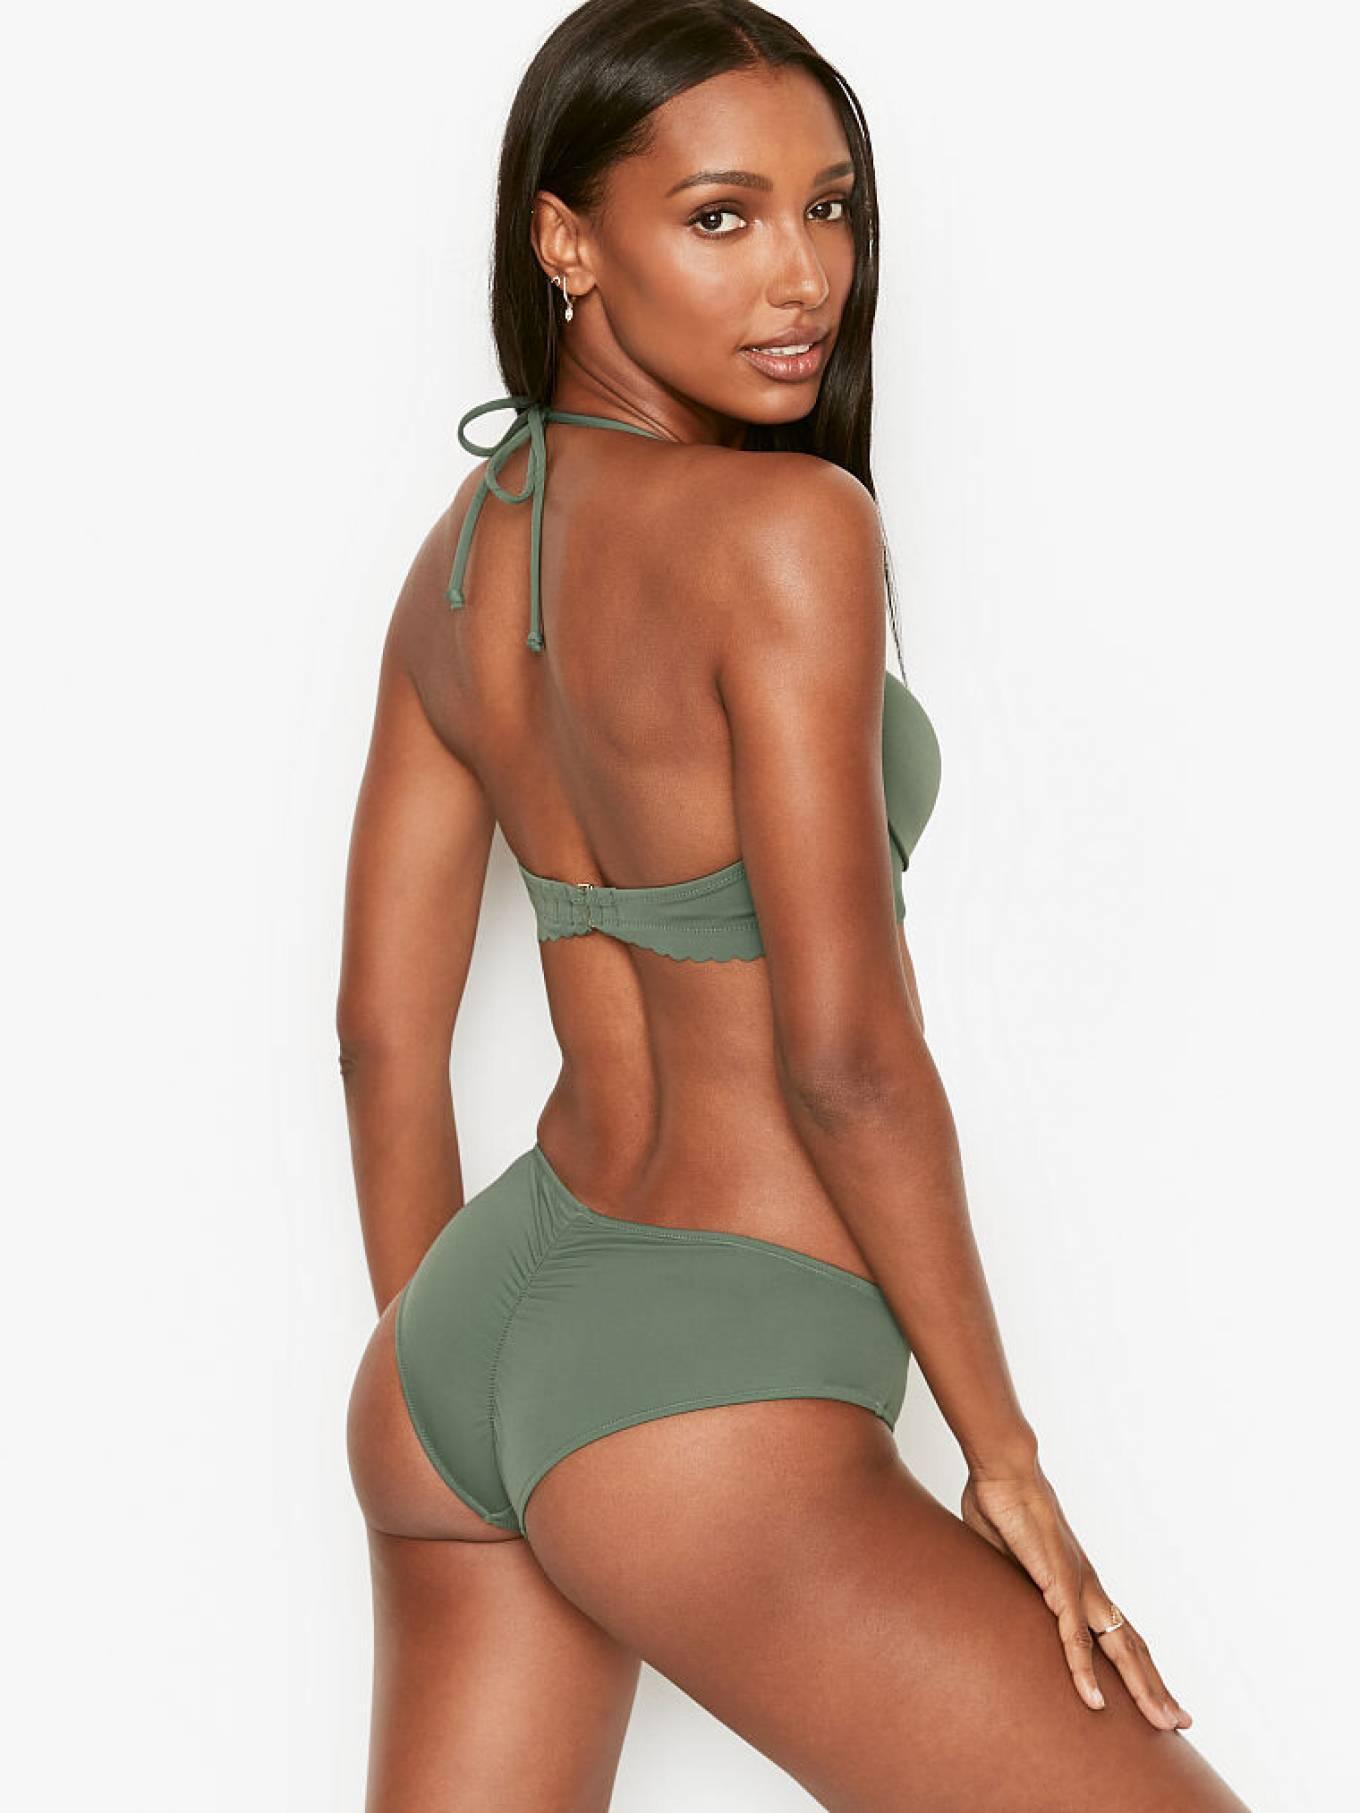 Jasmine Tookes 2020 : Jasmine Tookes – Victorias Secret collection – November 2020-03